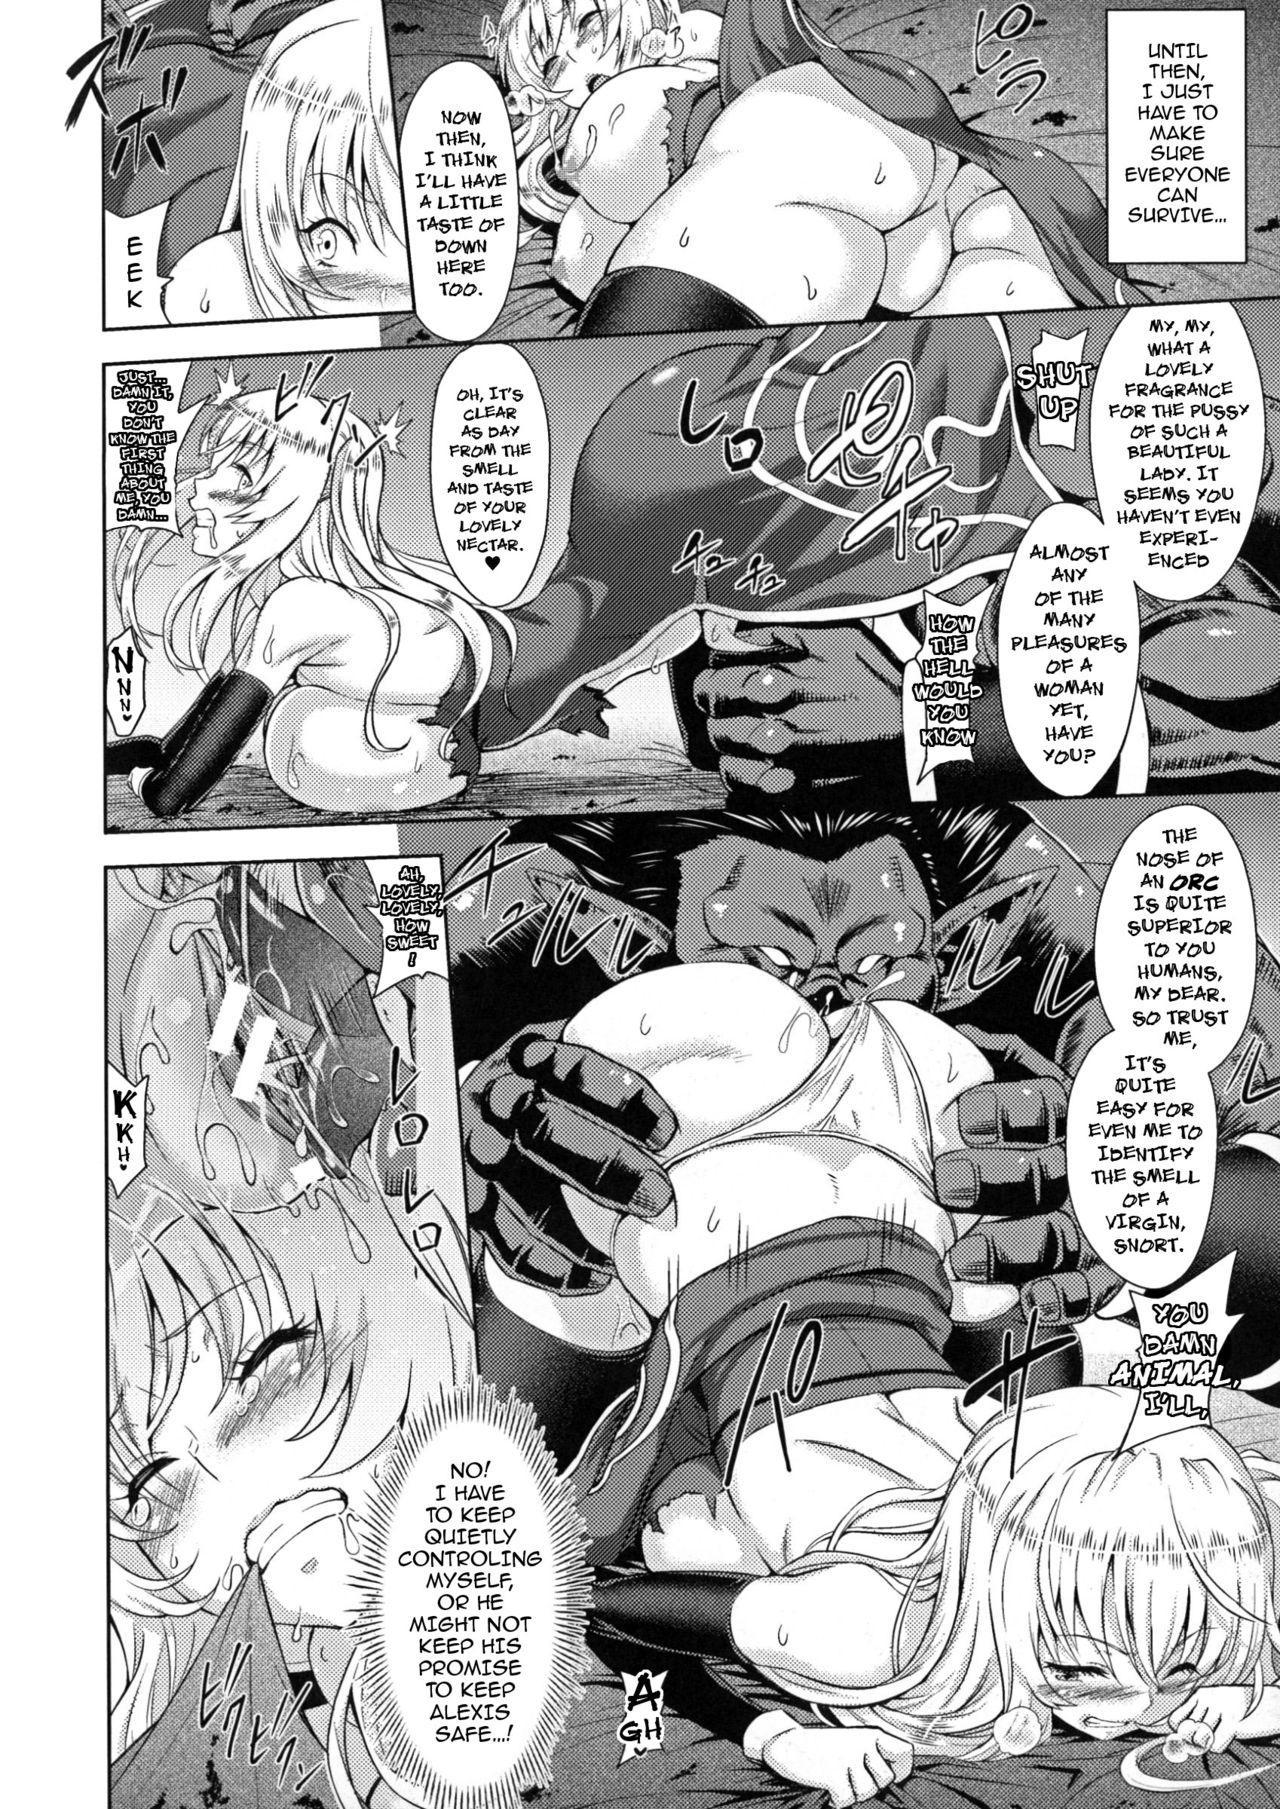 [Yamada Gogogo] ERONA Orc no Inmon ni Okasareta Onna Kishi no Matsuro Ichiwa | ERONA ~The Fall of a Beautiful Knight Cursed with the Lewd Mark of an Orc~ Ch. 1 The Oblivion of Climax (Seigi no Heroine Kangoku File DX Vol. 7) [English] {darknight} 14